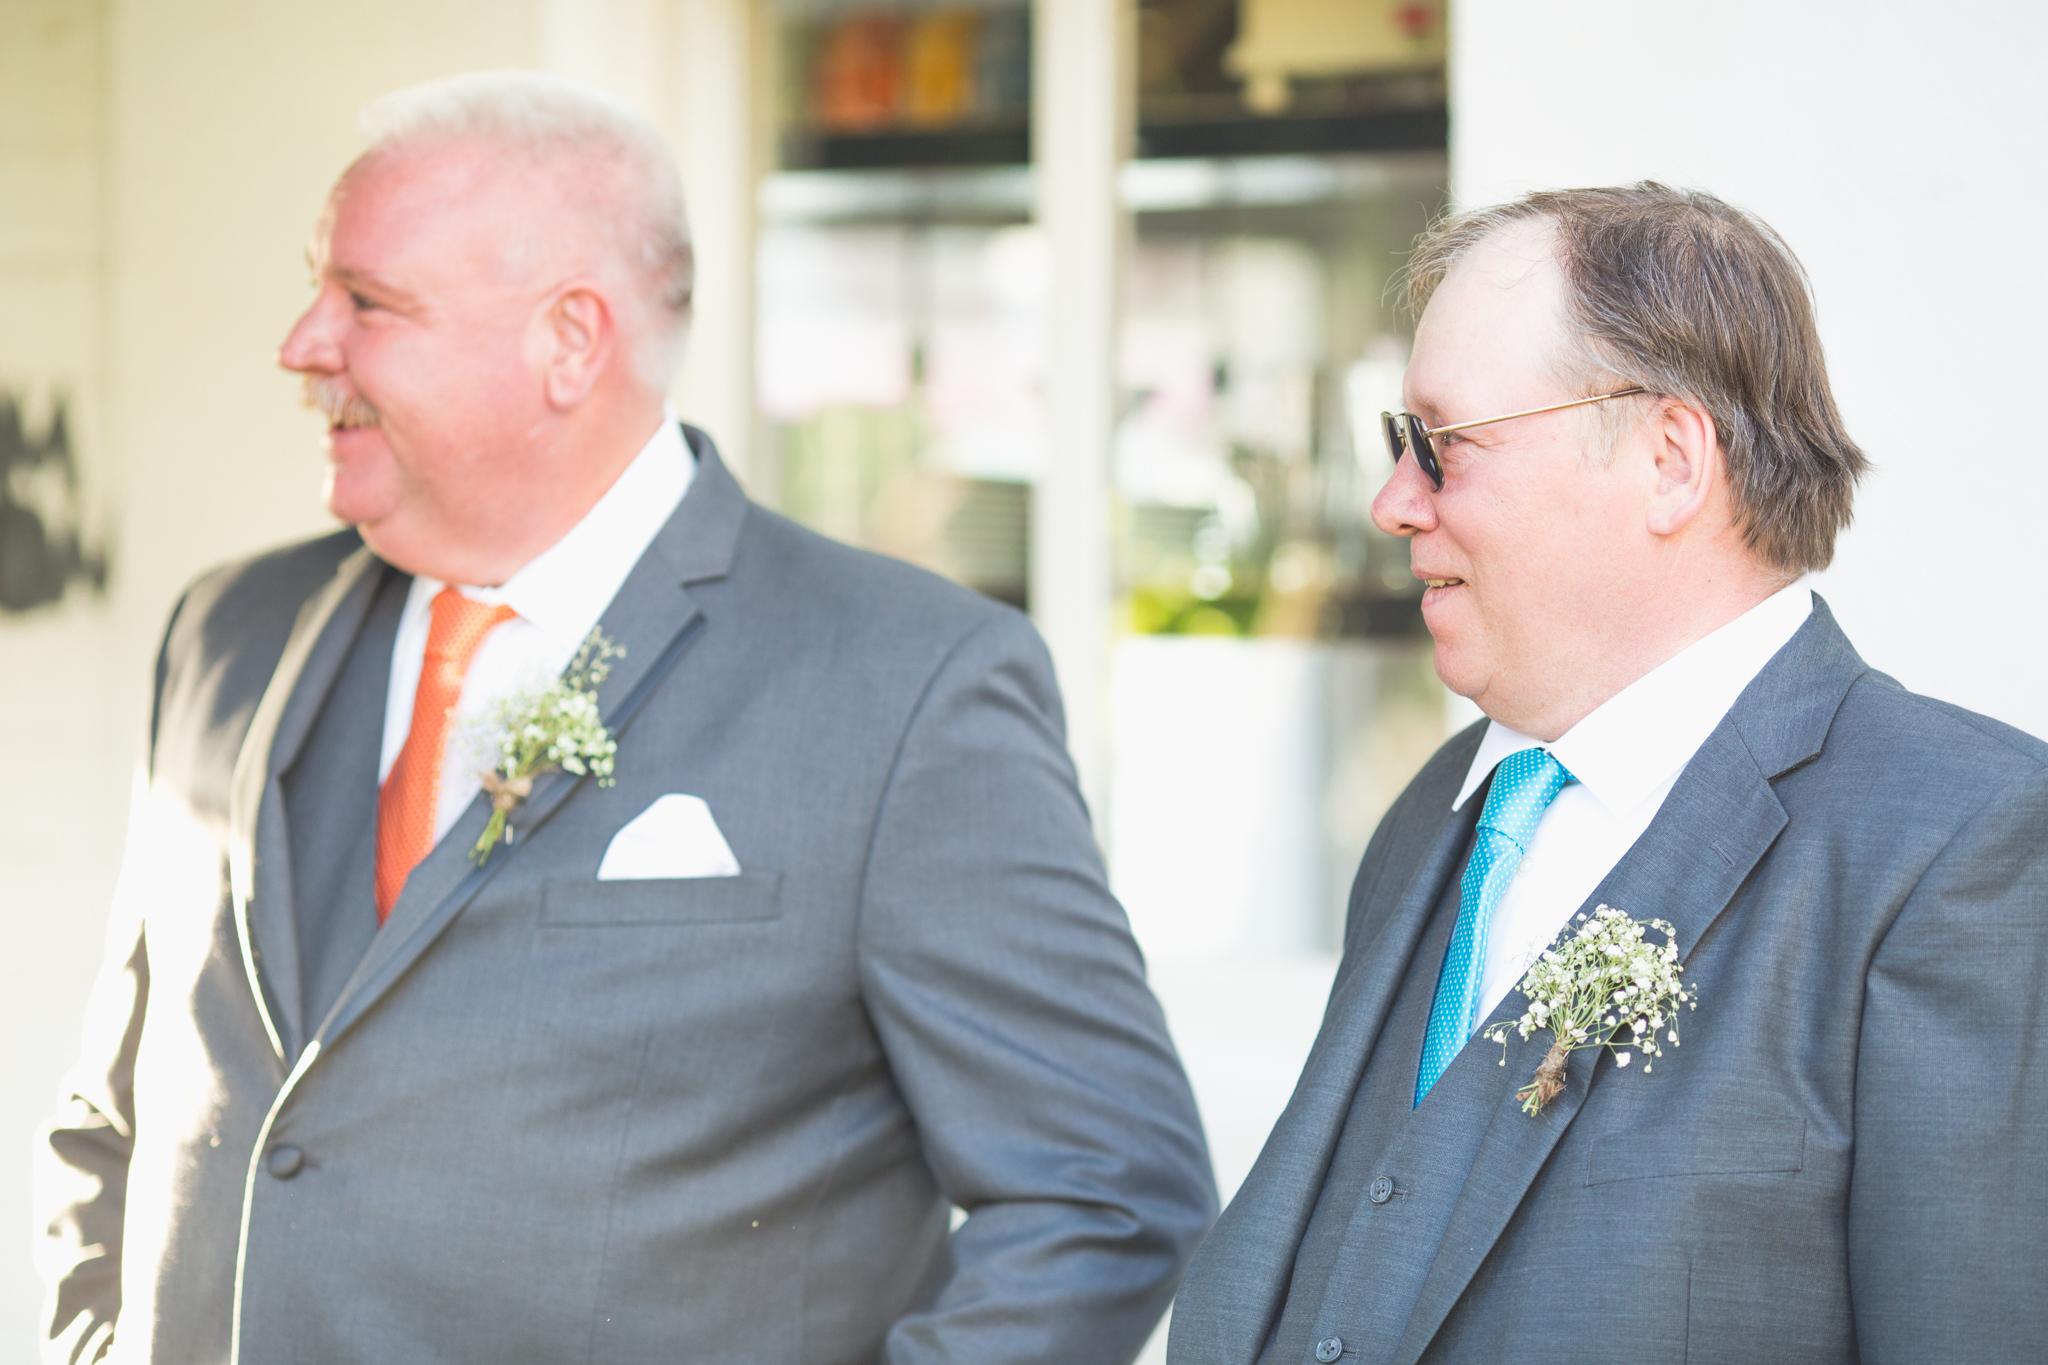 scottsdale-wedding-el-dorado-resort-fathers